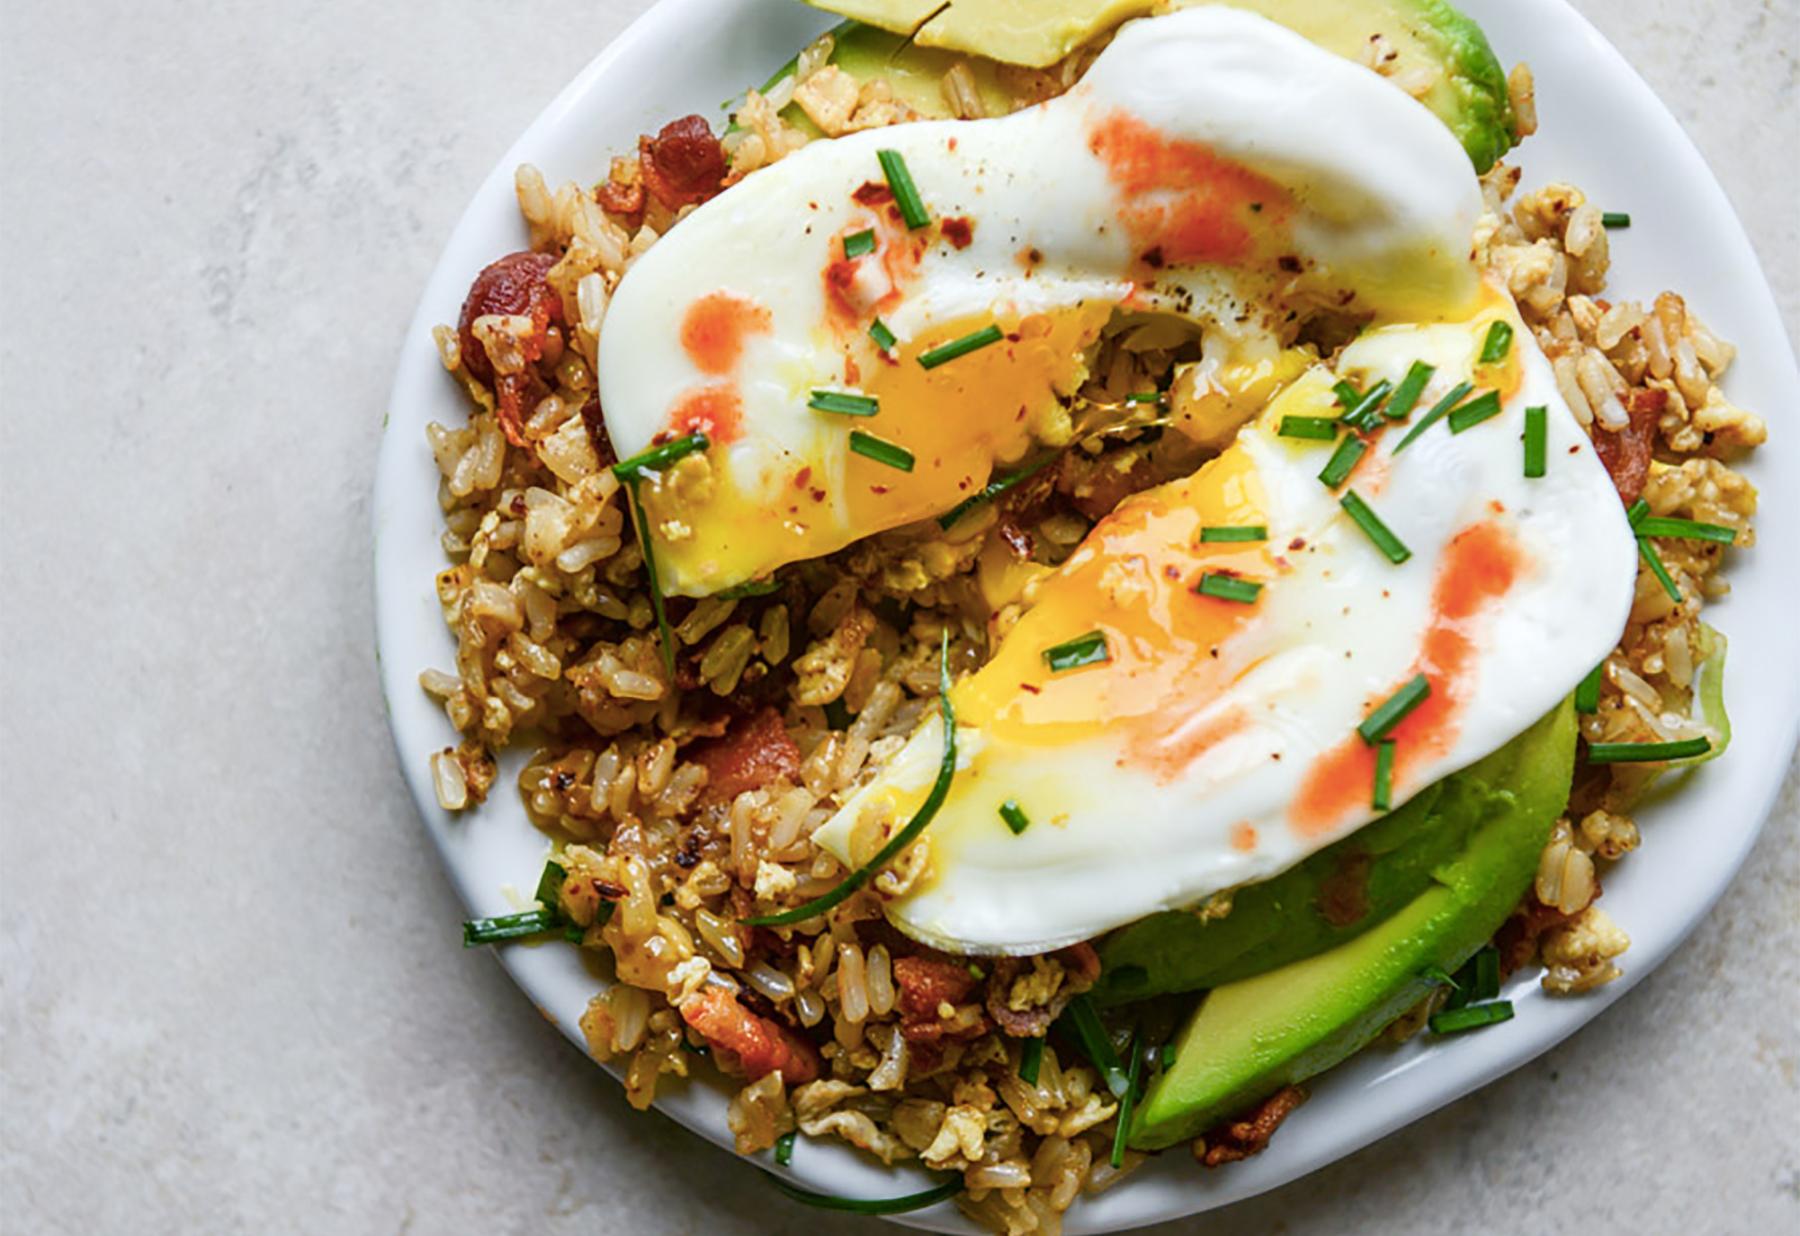 Healthy Breakfast Recipes With No Added Sugar